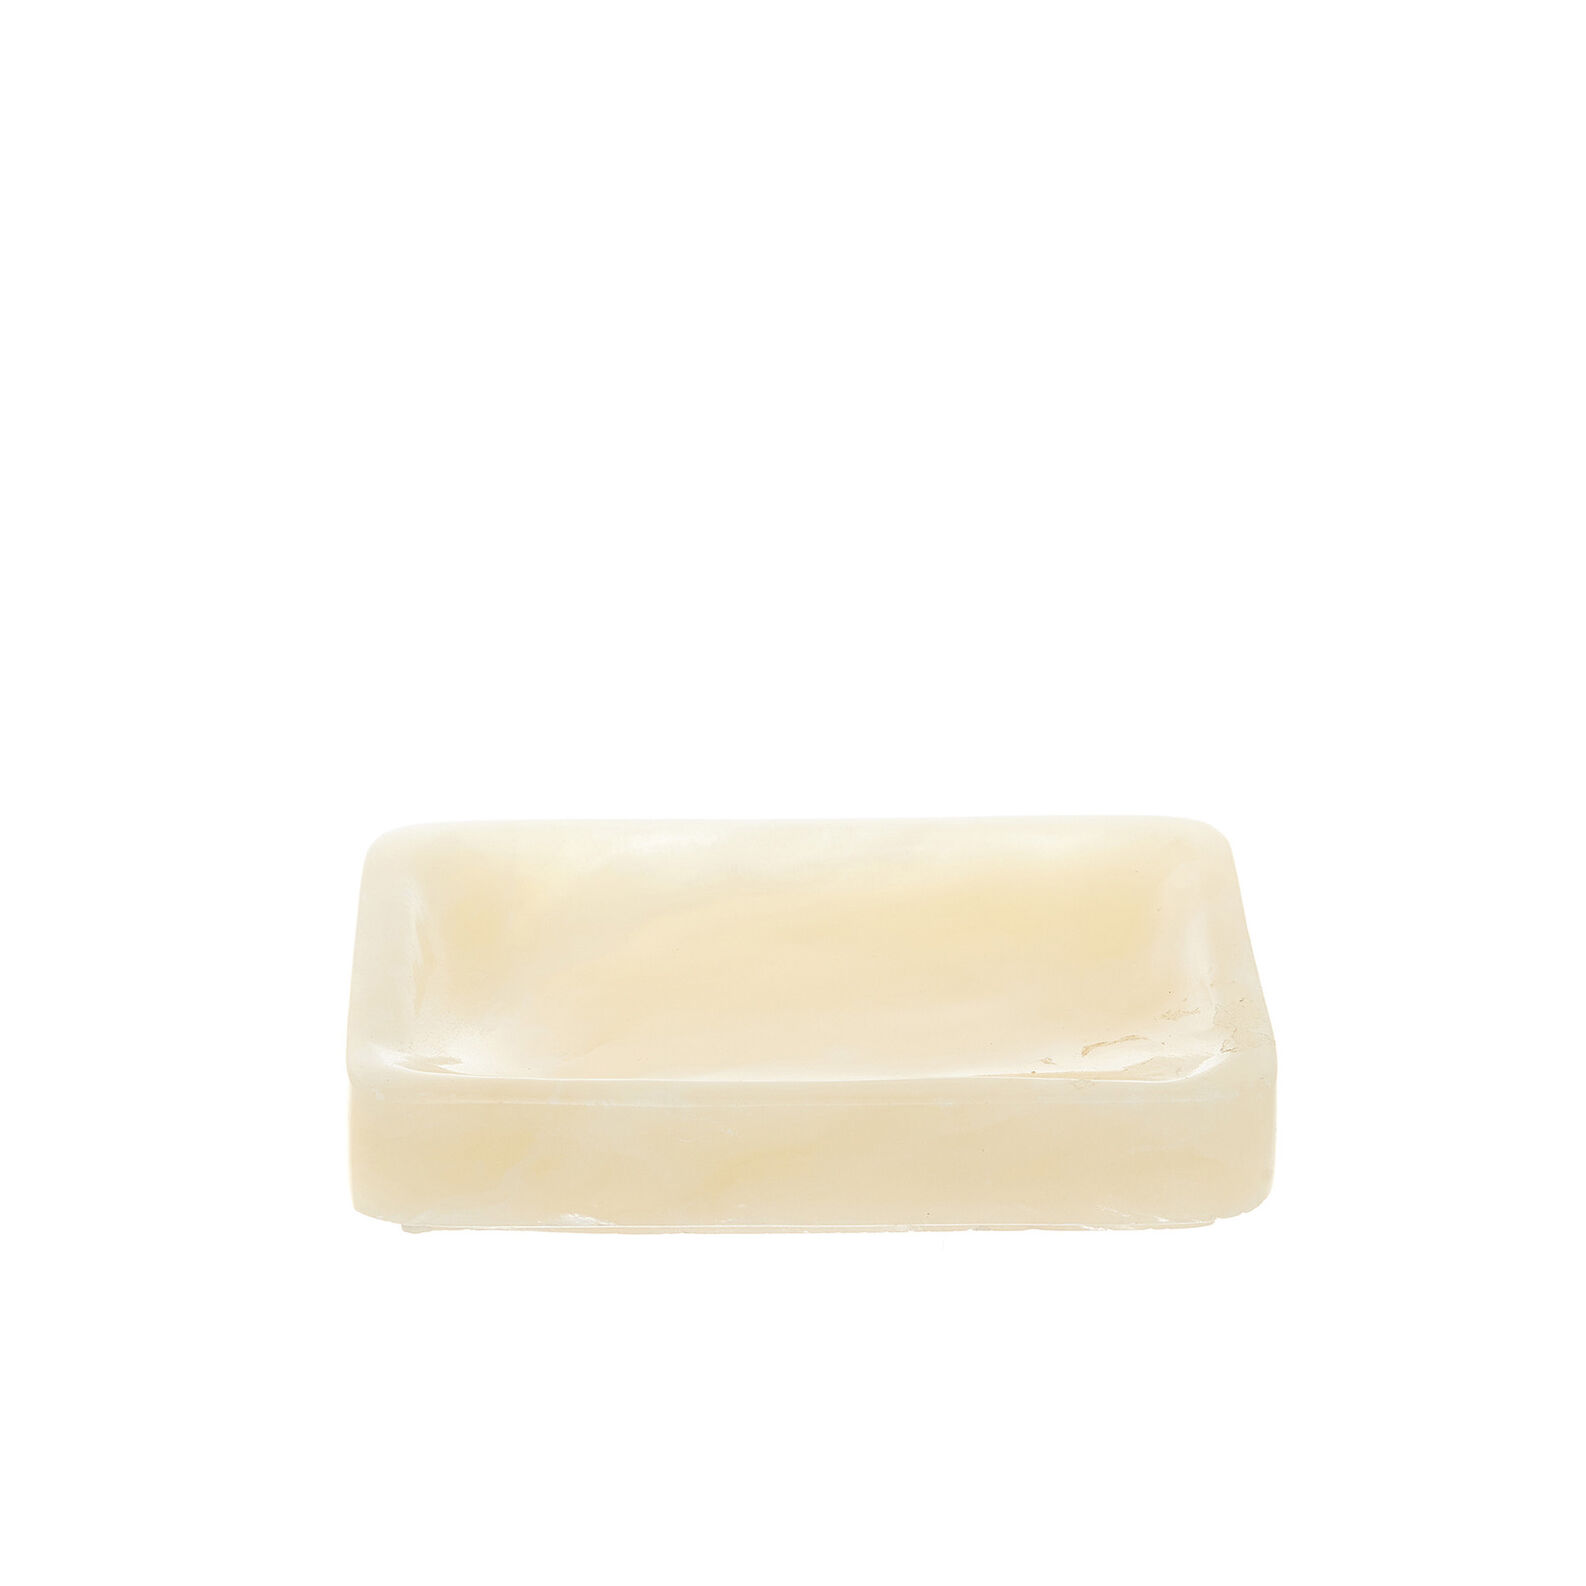 Solid handmade onyx soap dish